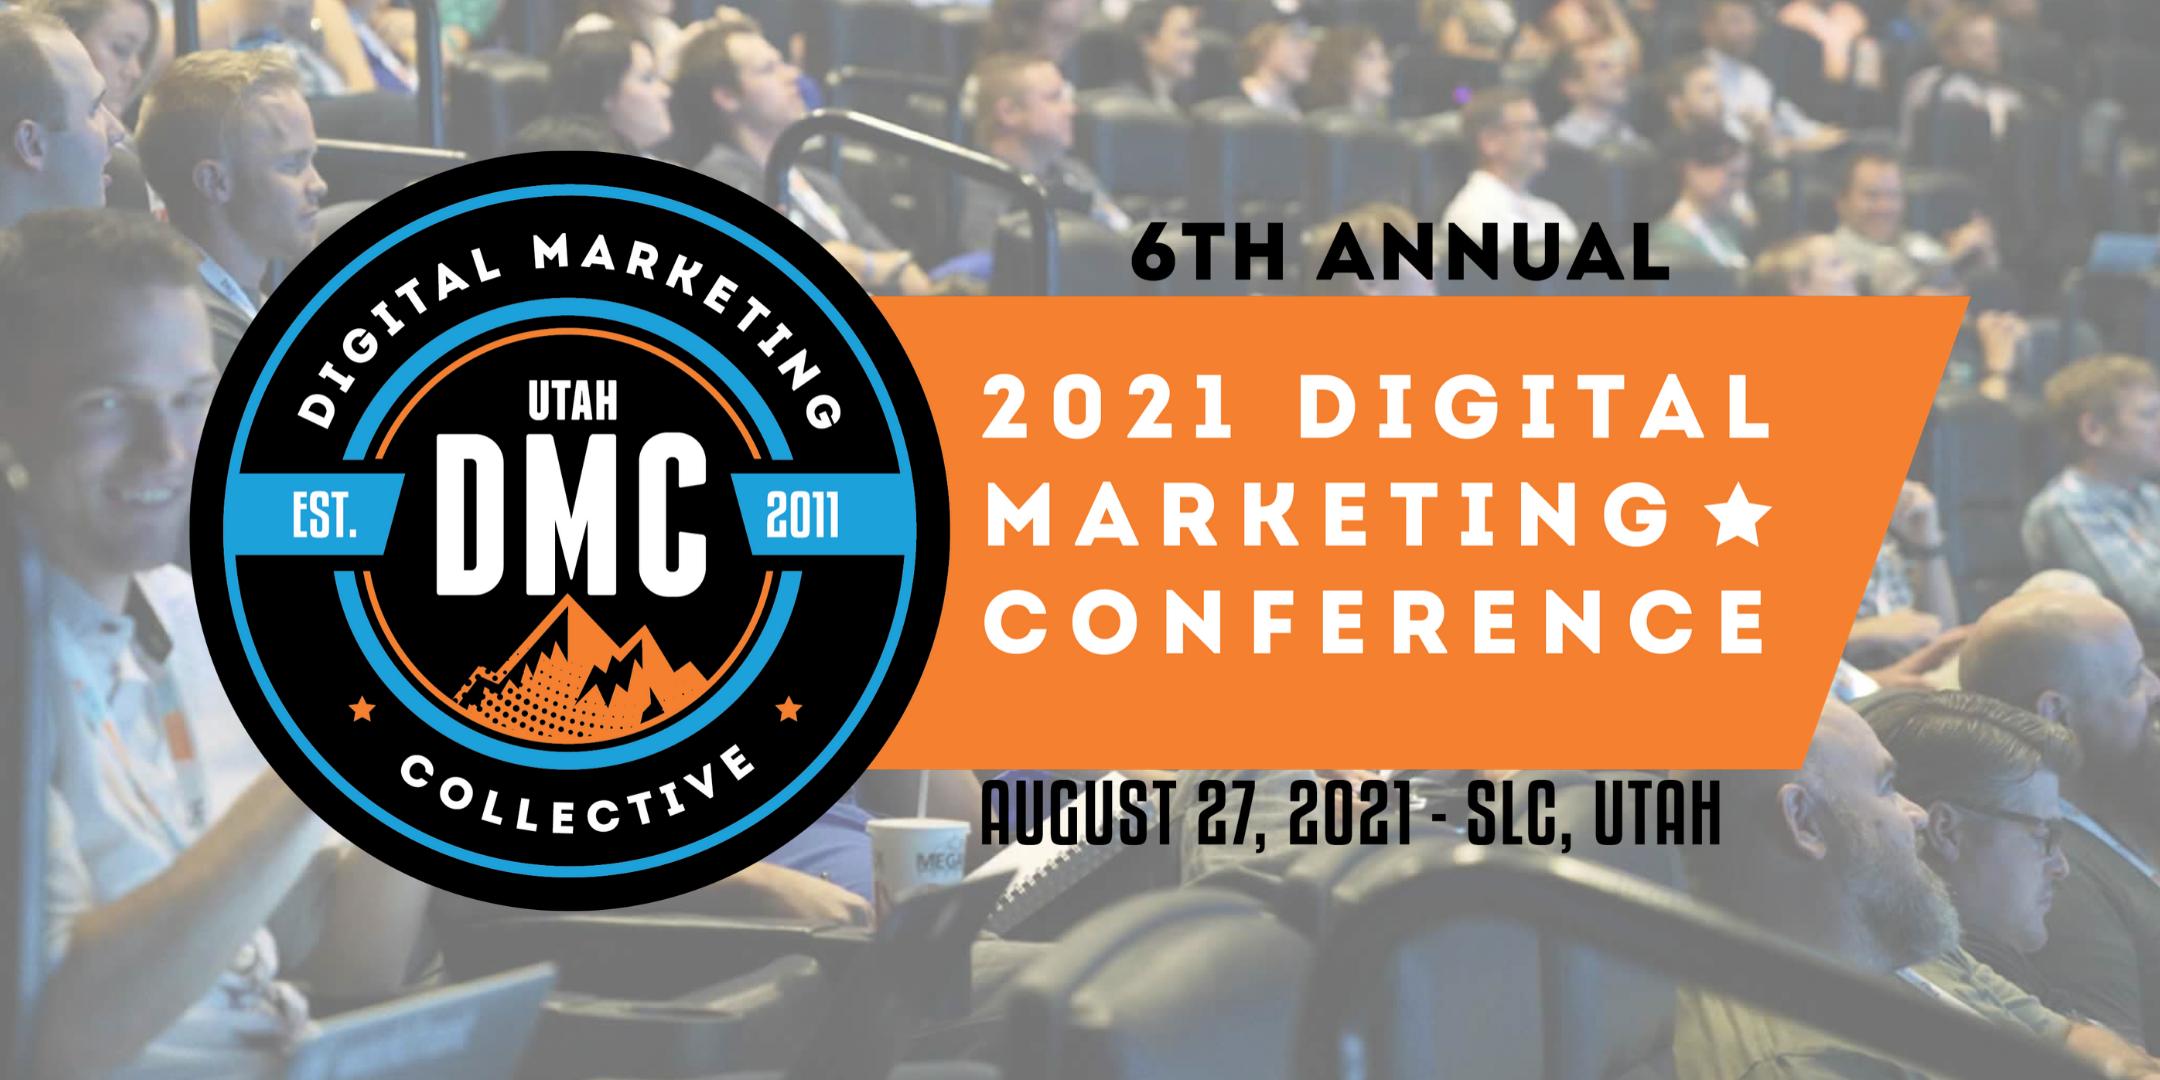 Utah DMC 6th Annual 2021 Digital Marketing Conference